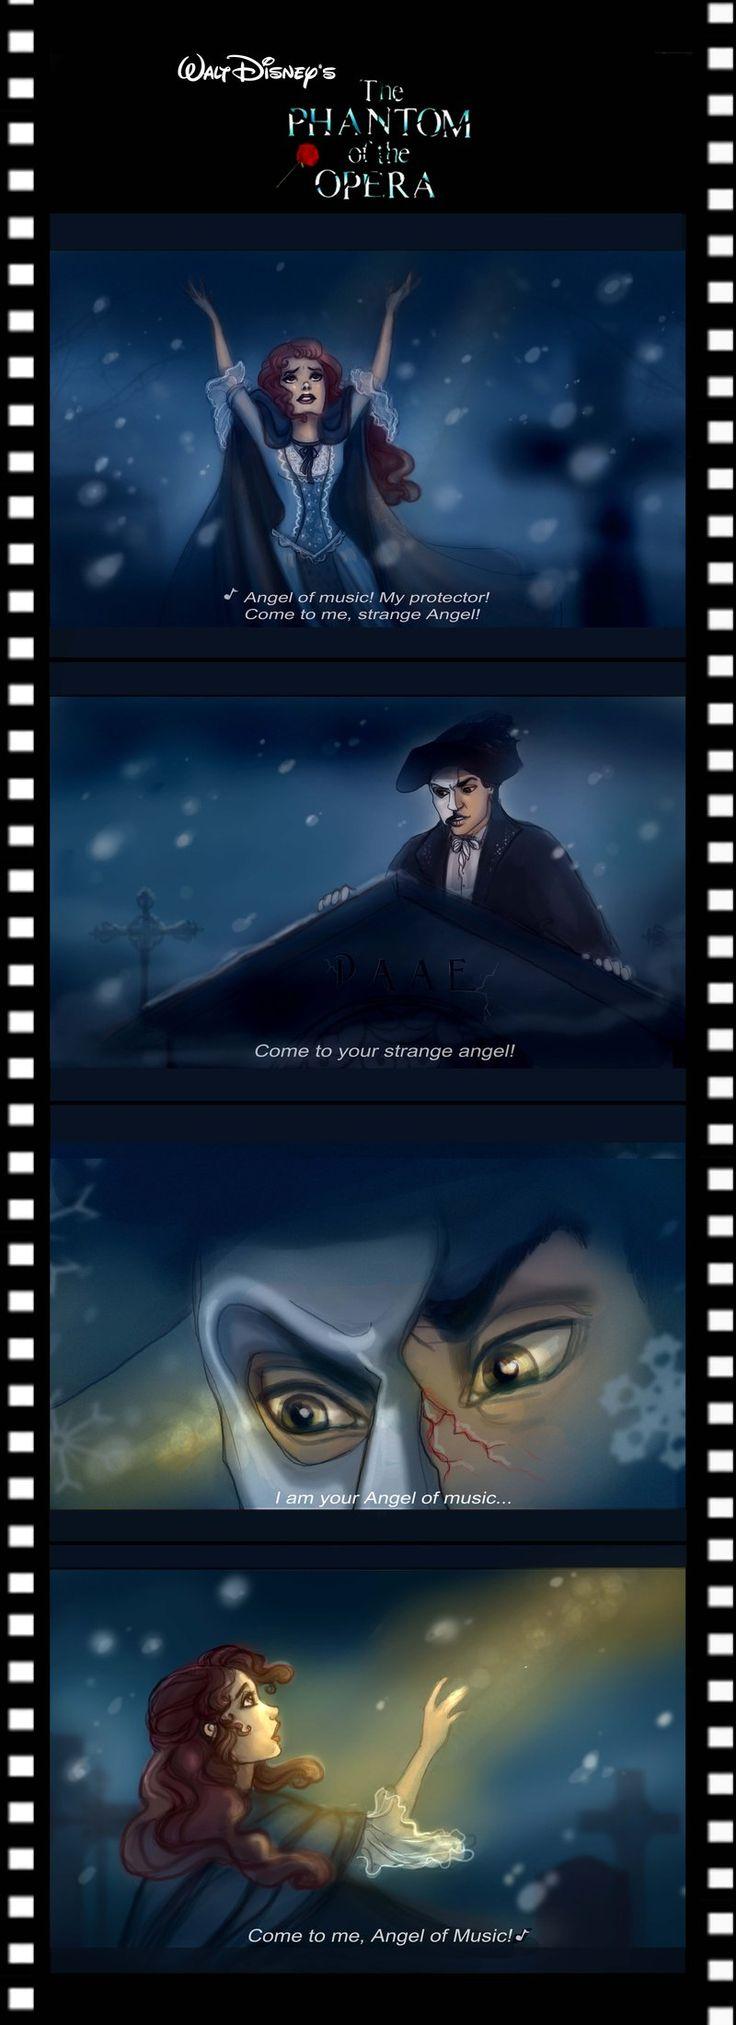 Disney's Phantom - sneak peek by Elf-in-mirror.deviantart.com on @deviantART